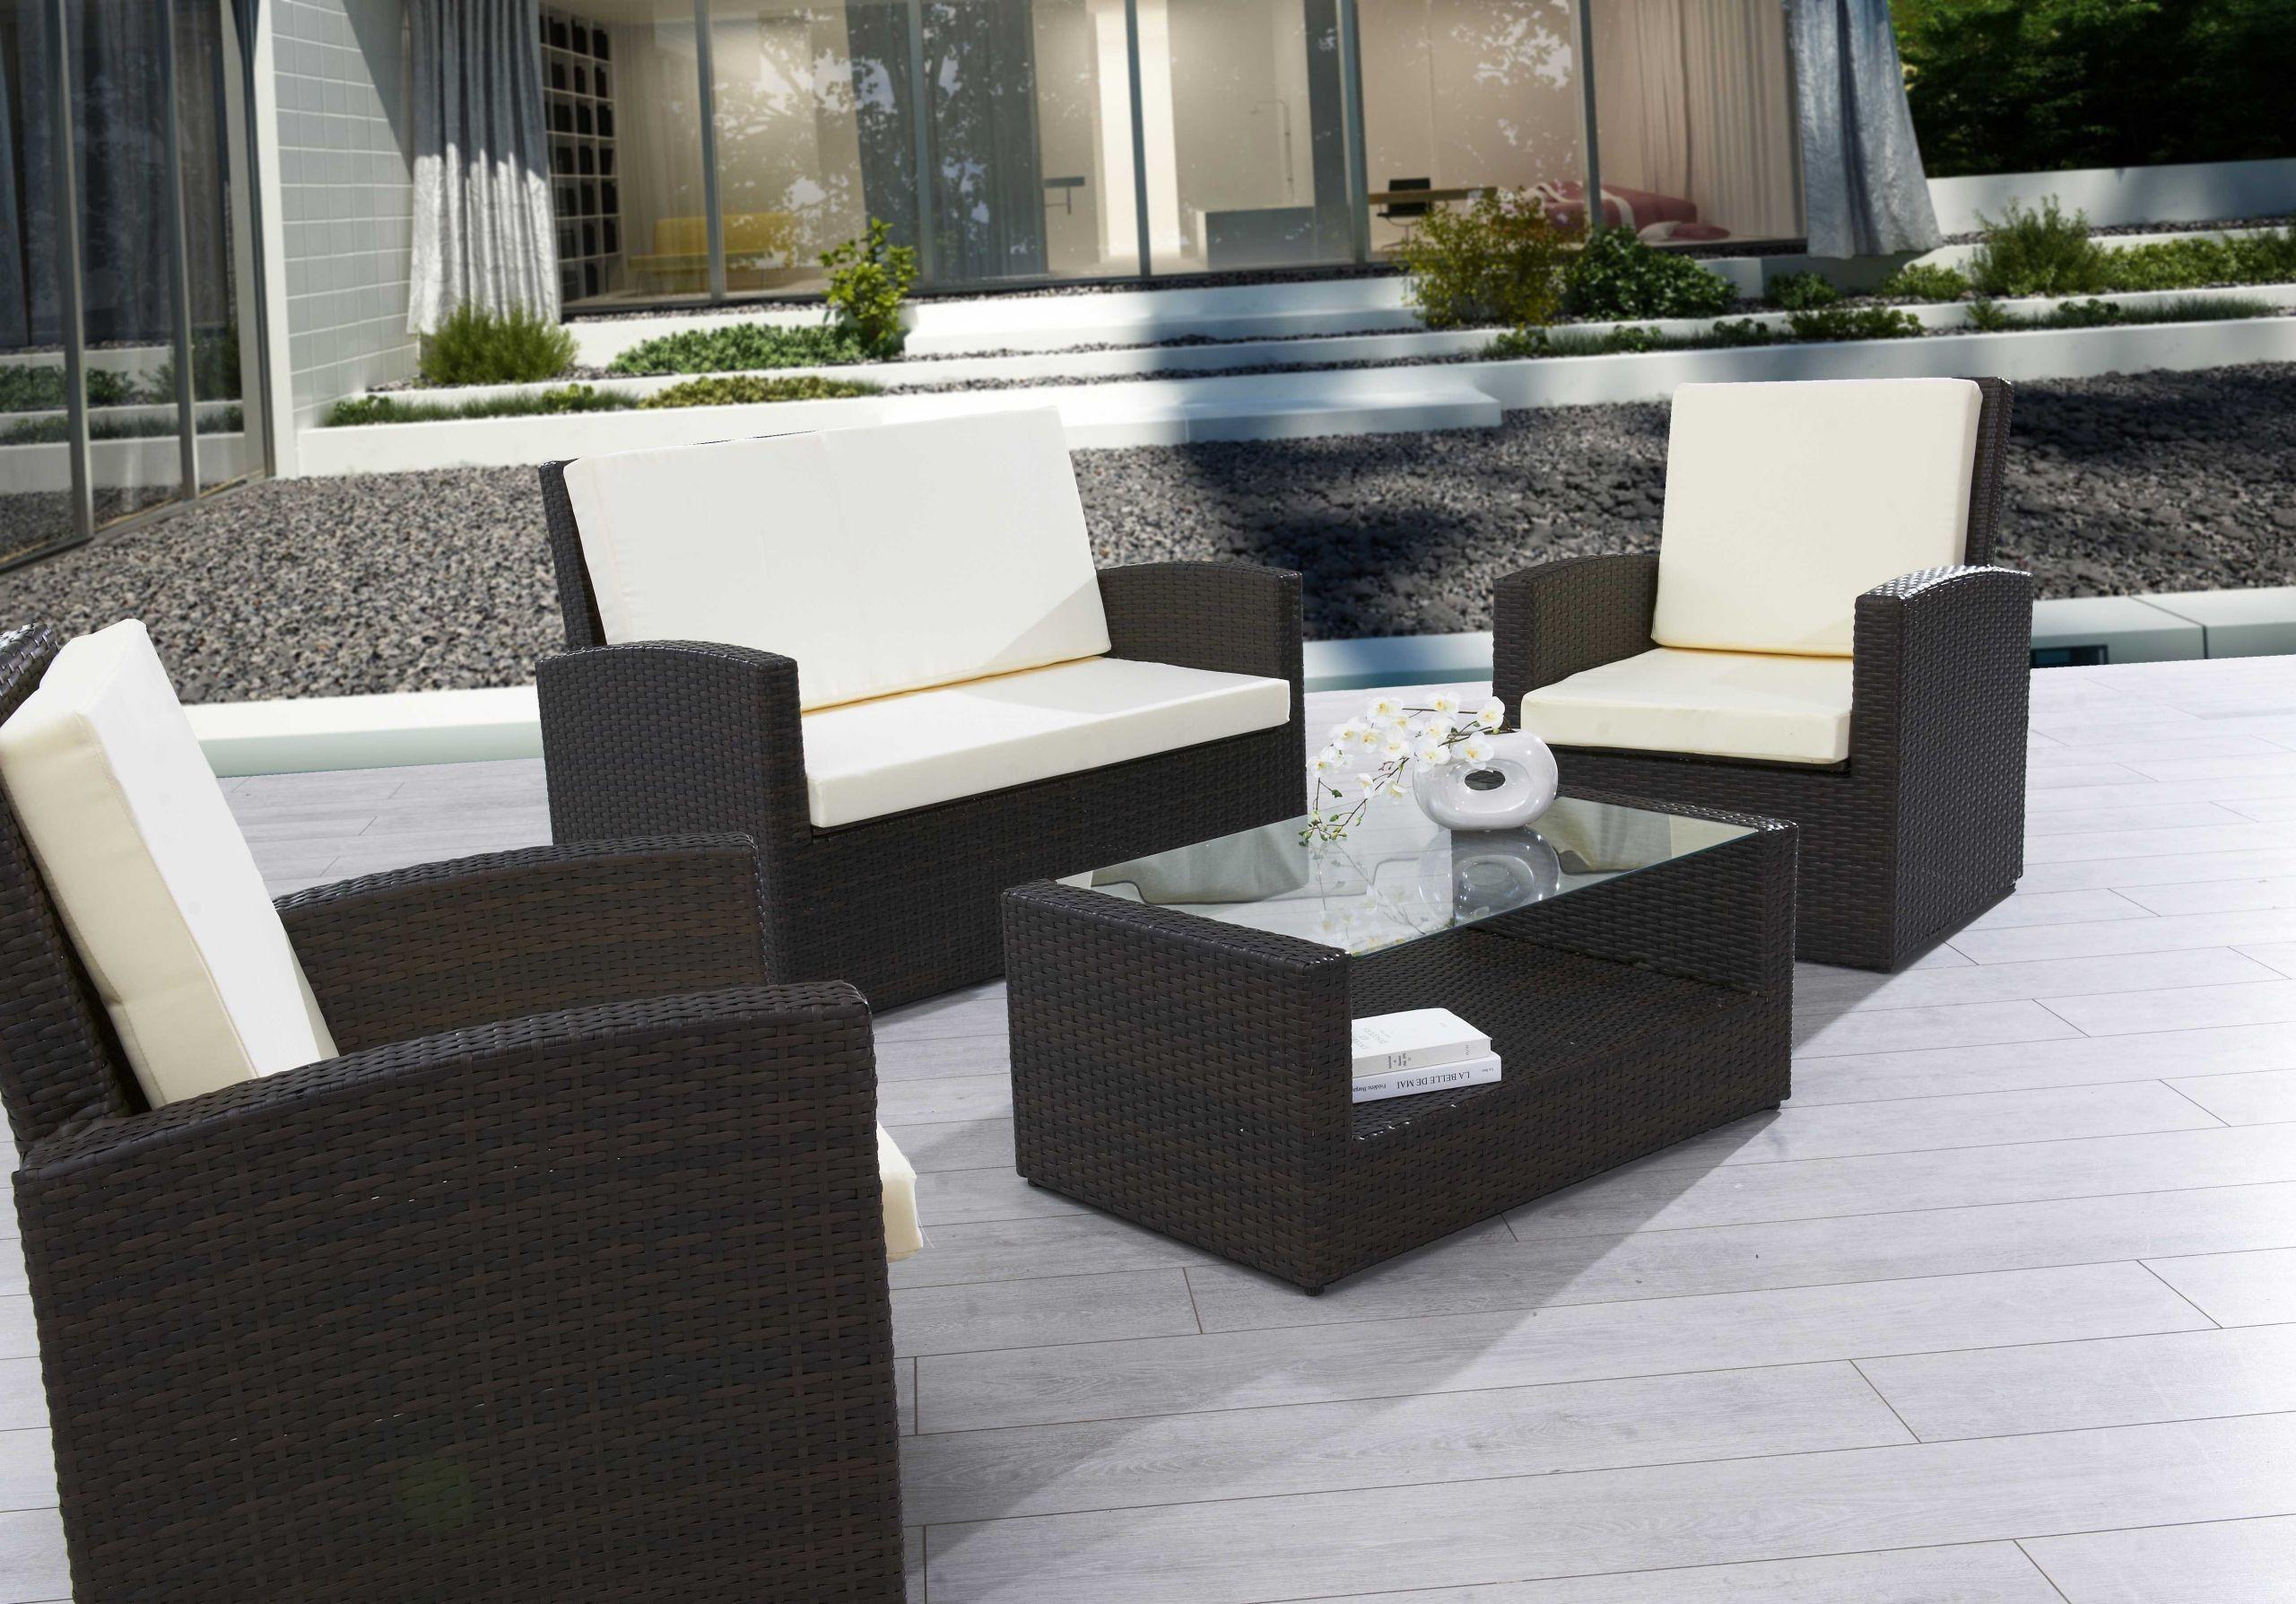 24 Luxe Salon De Jardin Pour Balcon   Salon Jardin avec Salon De Jardin Par Cher